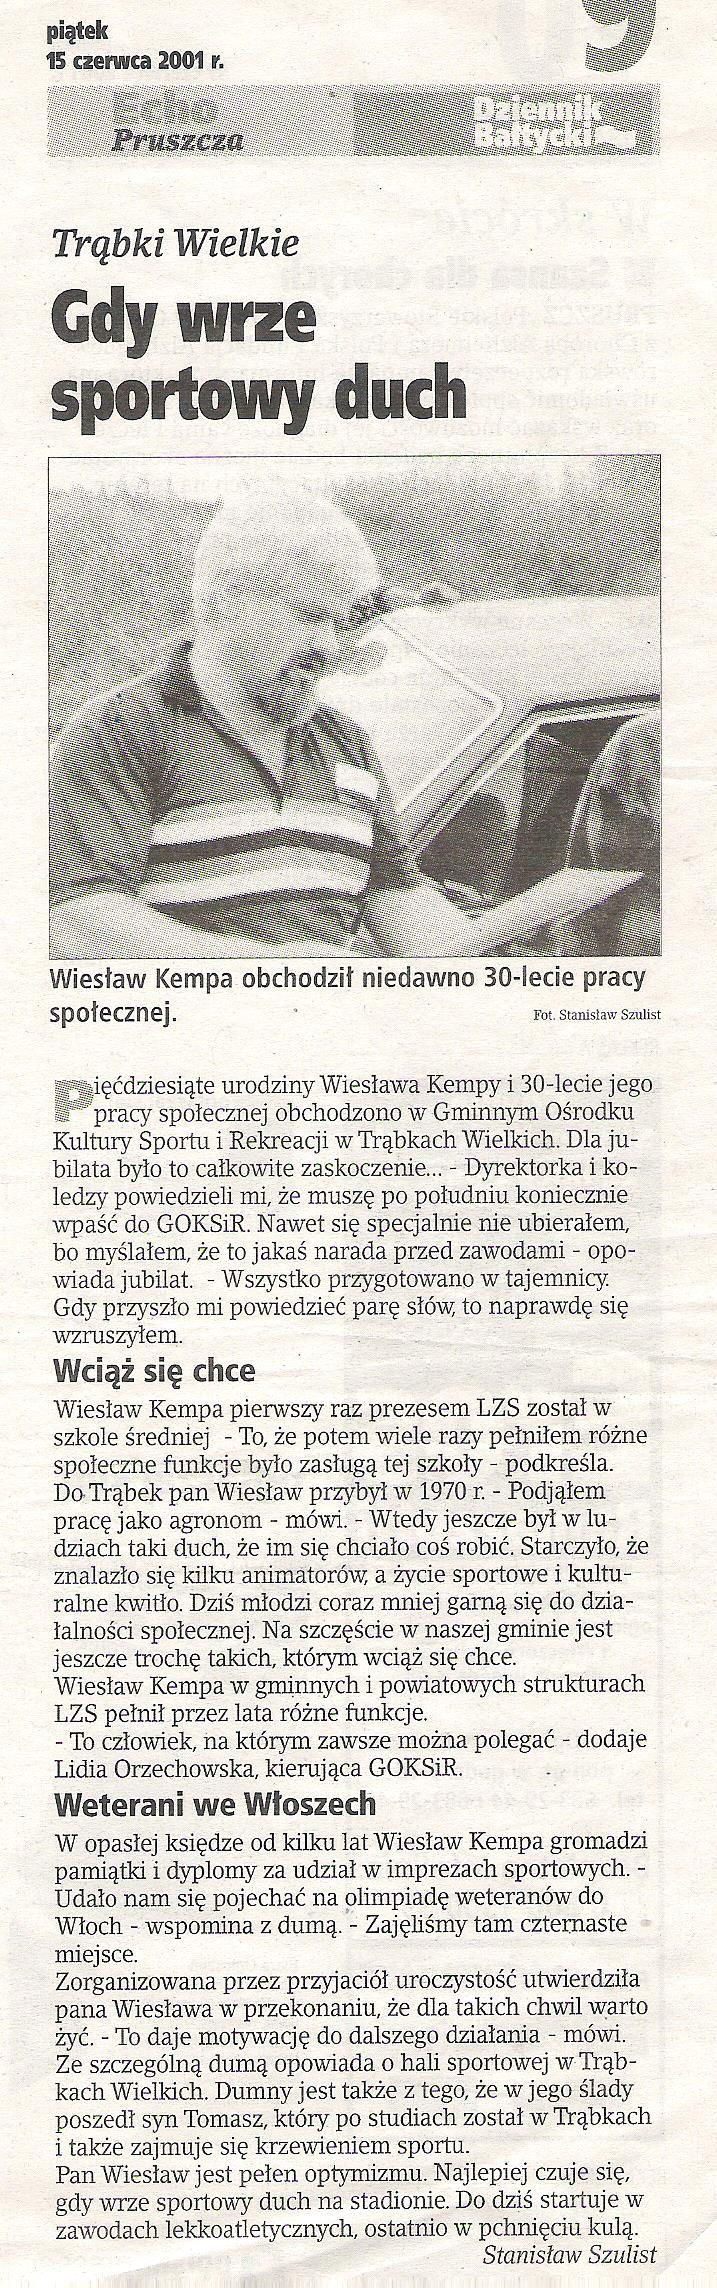 dzb15.06.2001